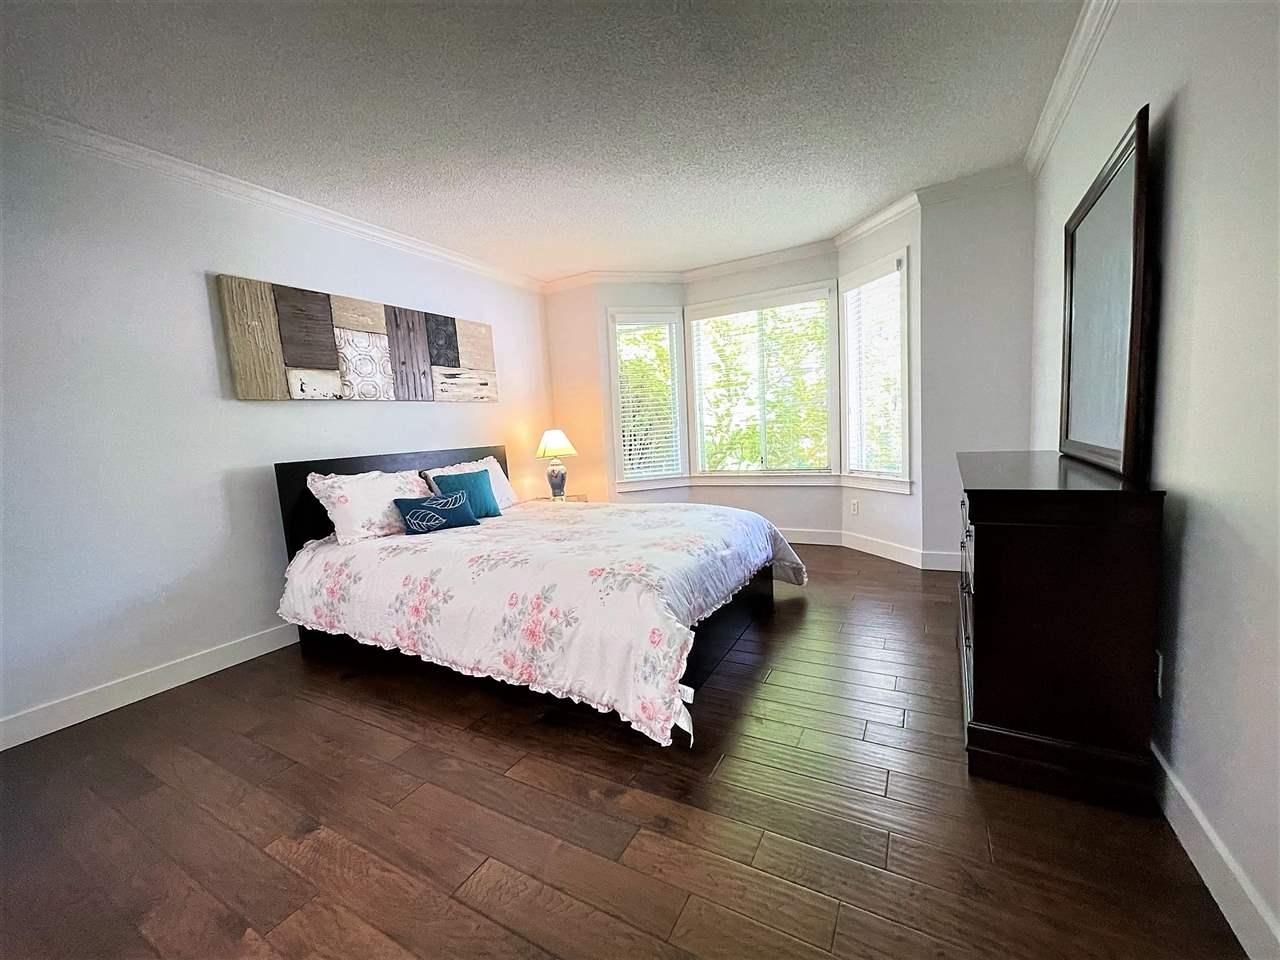 104 9045 WALNUT GROVE DRIVE - Walnut Grove Townhouse for sale, 3 Bedrooms (R2588351) #16